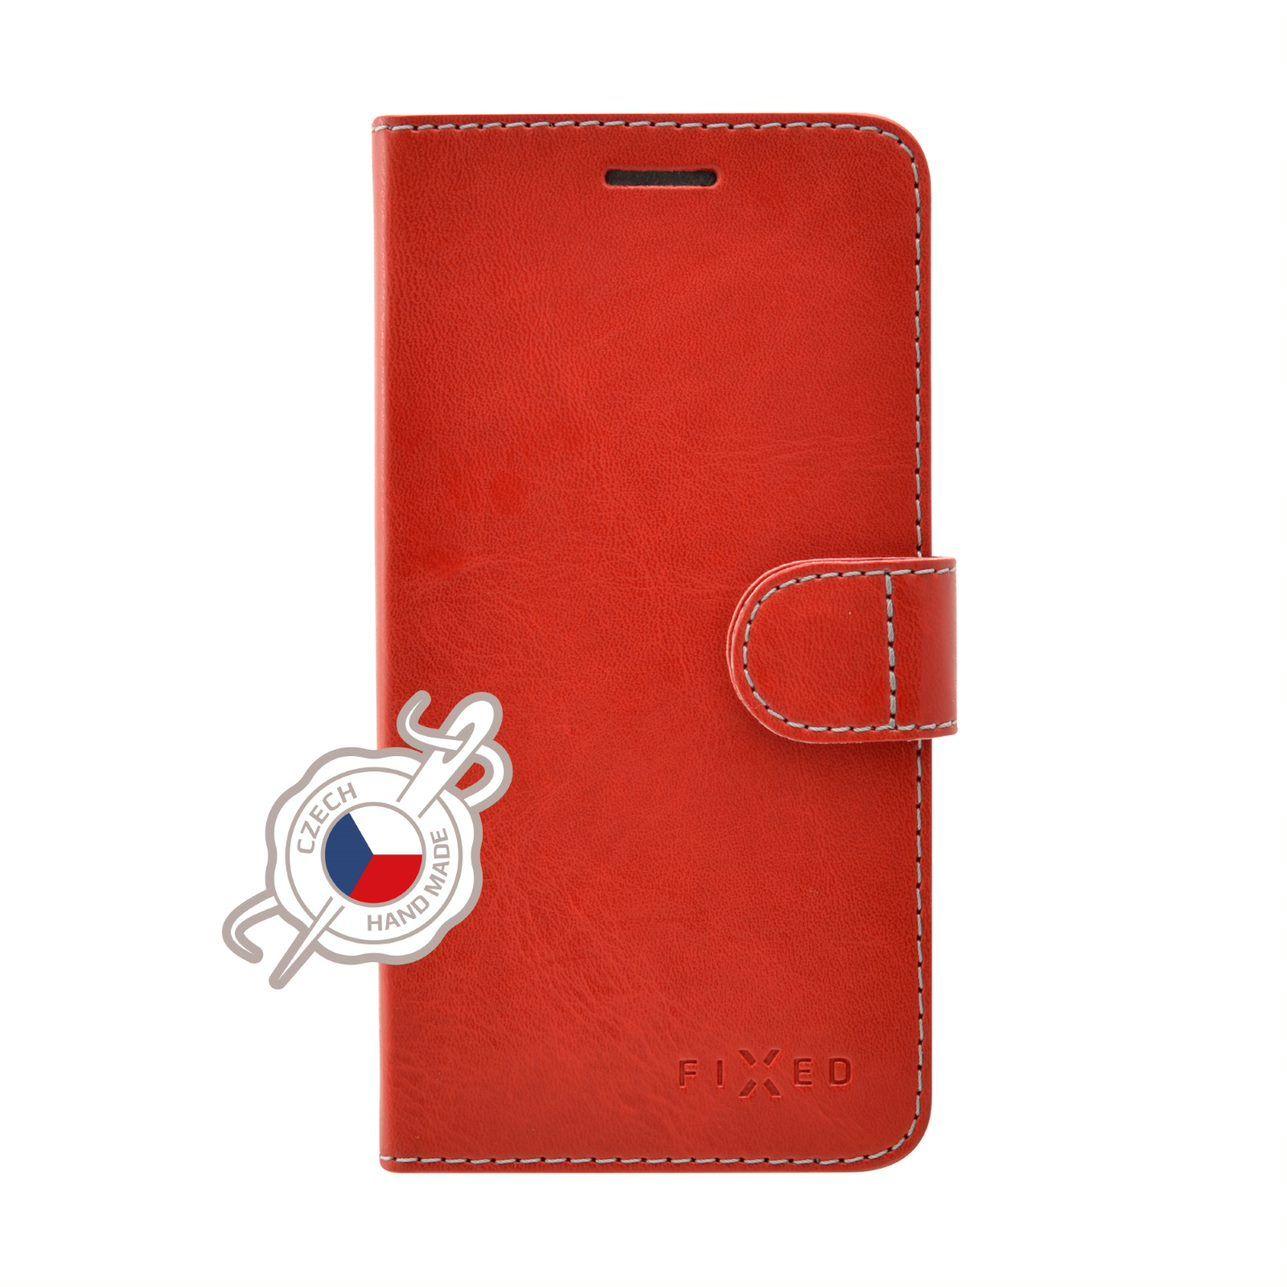 Pouzdro typu kniha FIXED FIT pro Xiaomi Redmi Note 6 Pro, červené